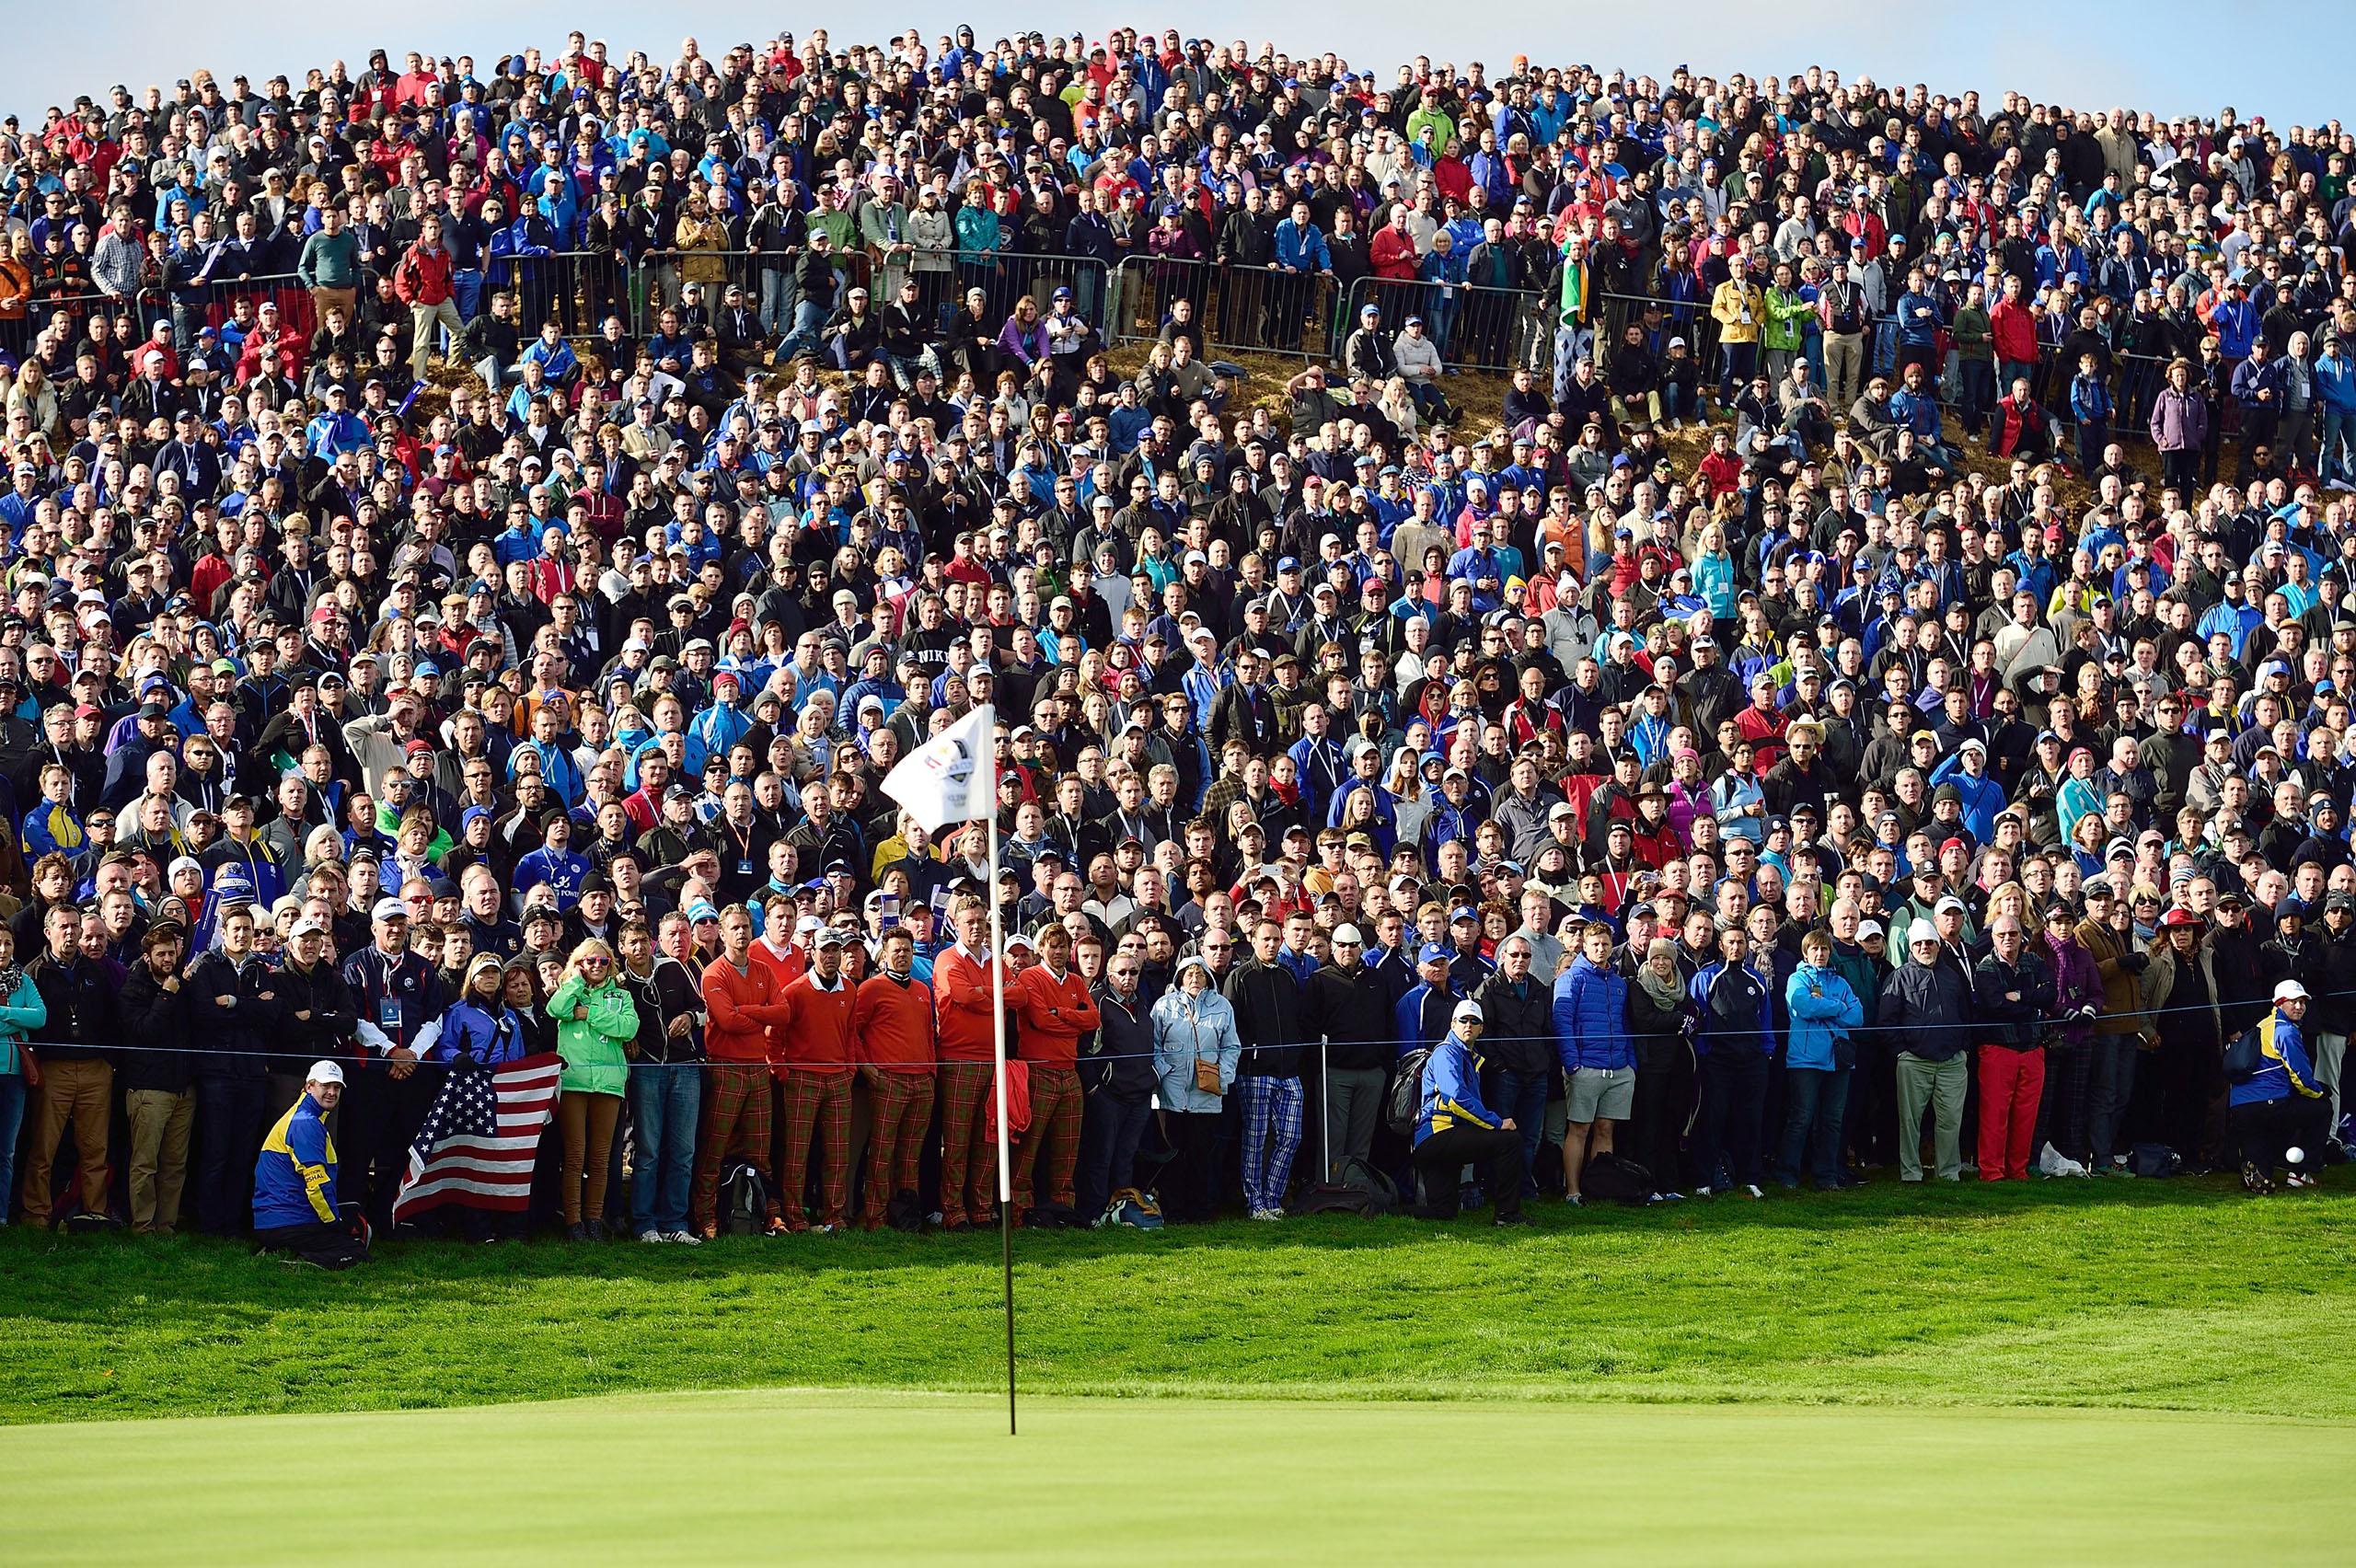 2014 Ryder Cup, Gleneagles, Scotland